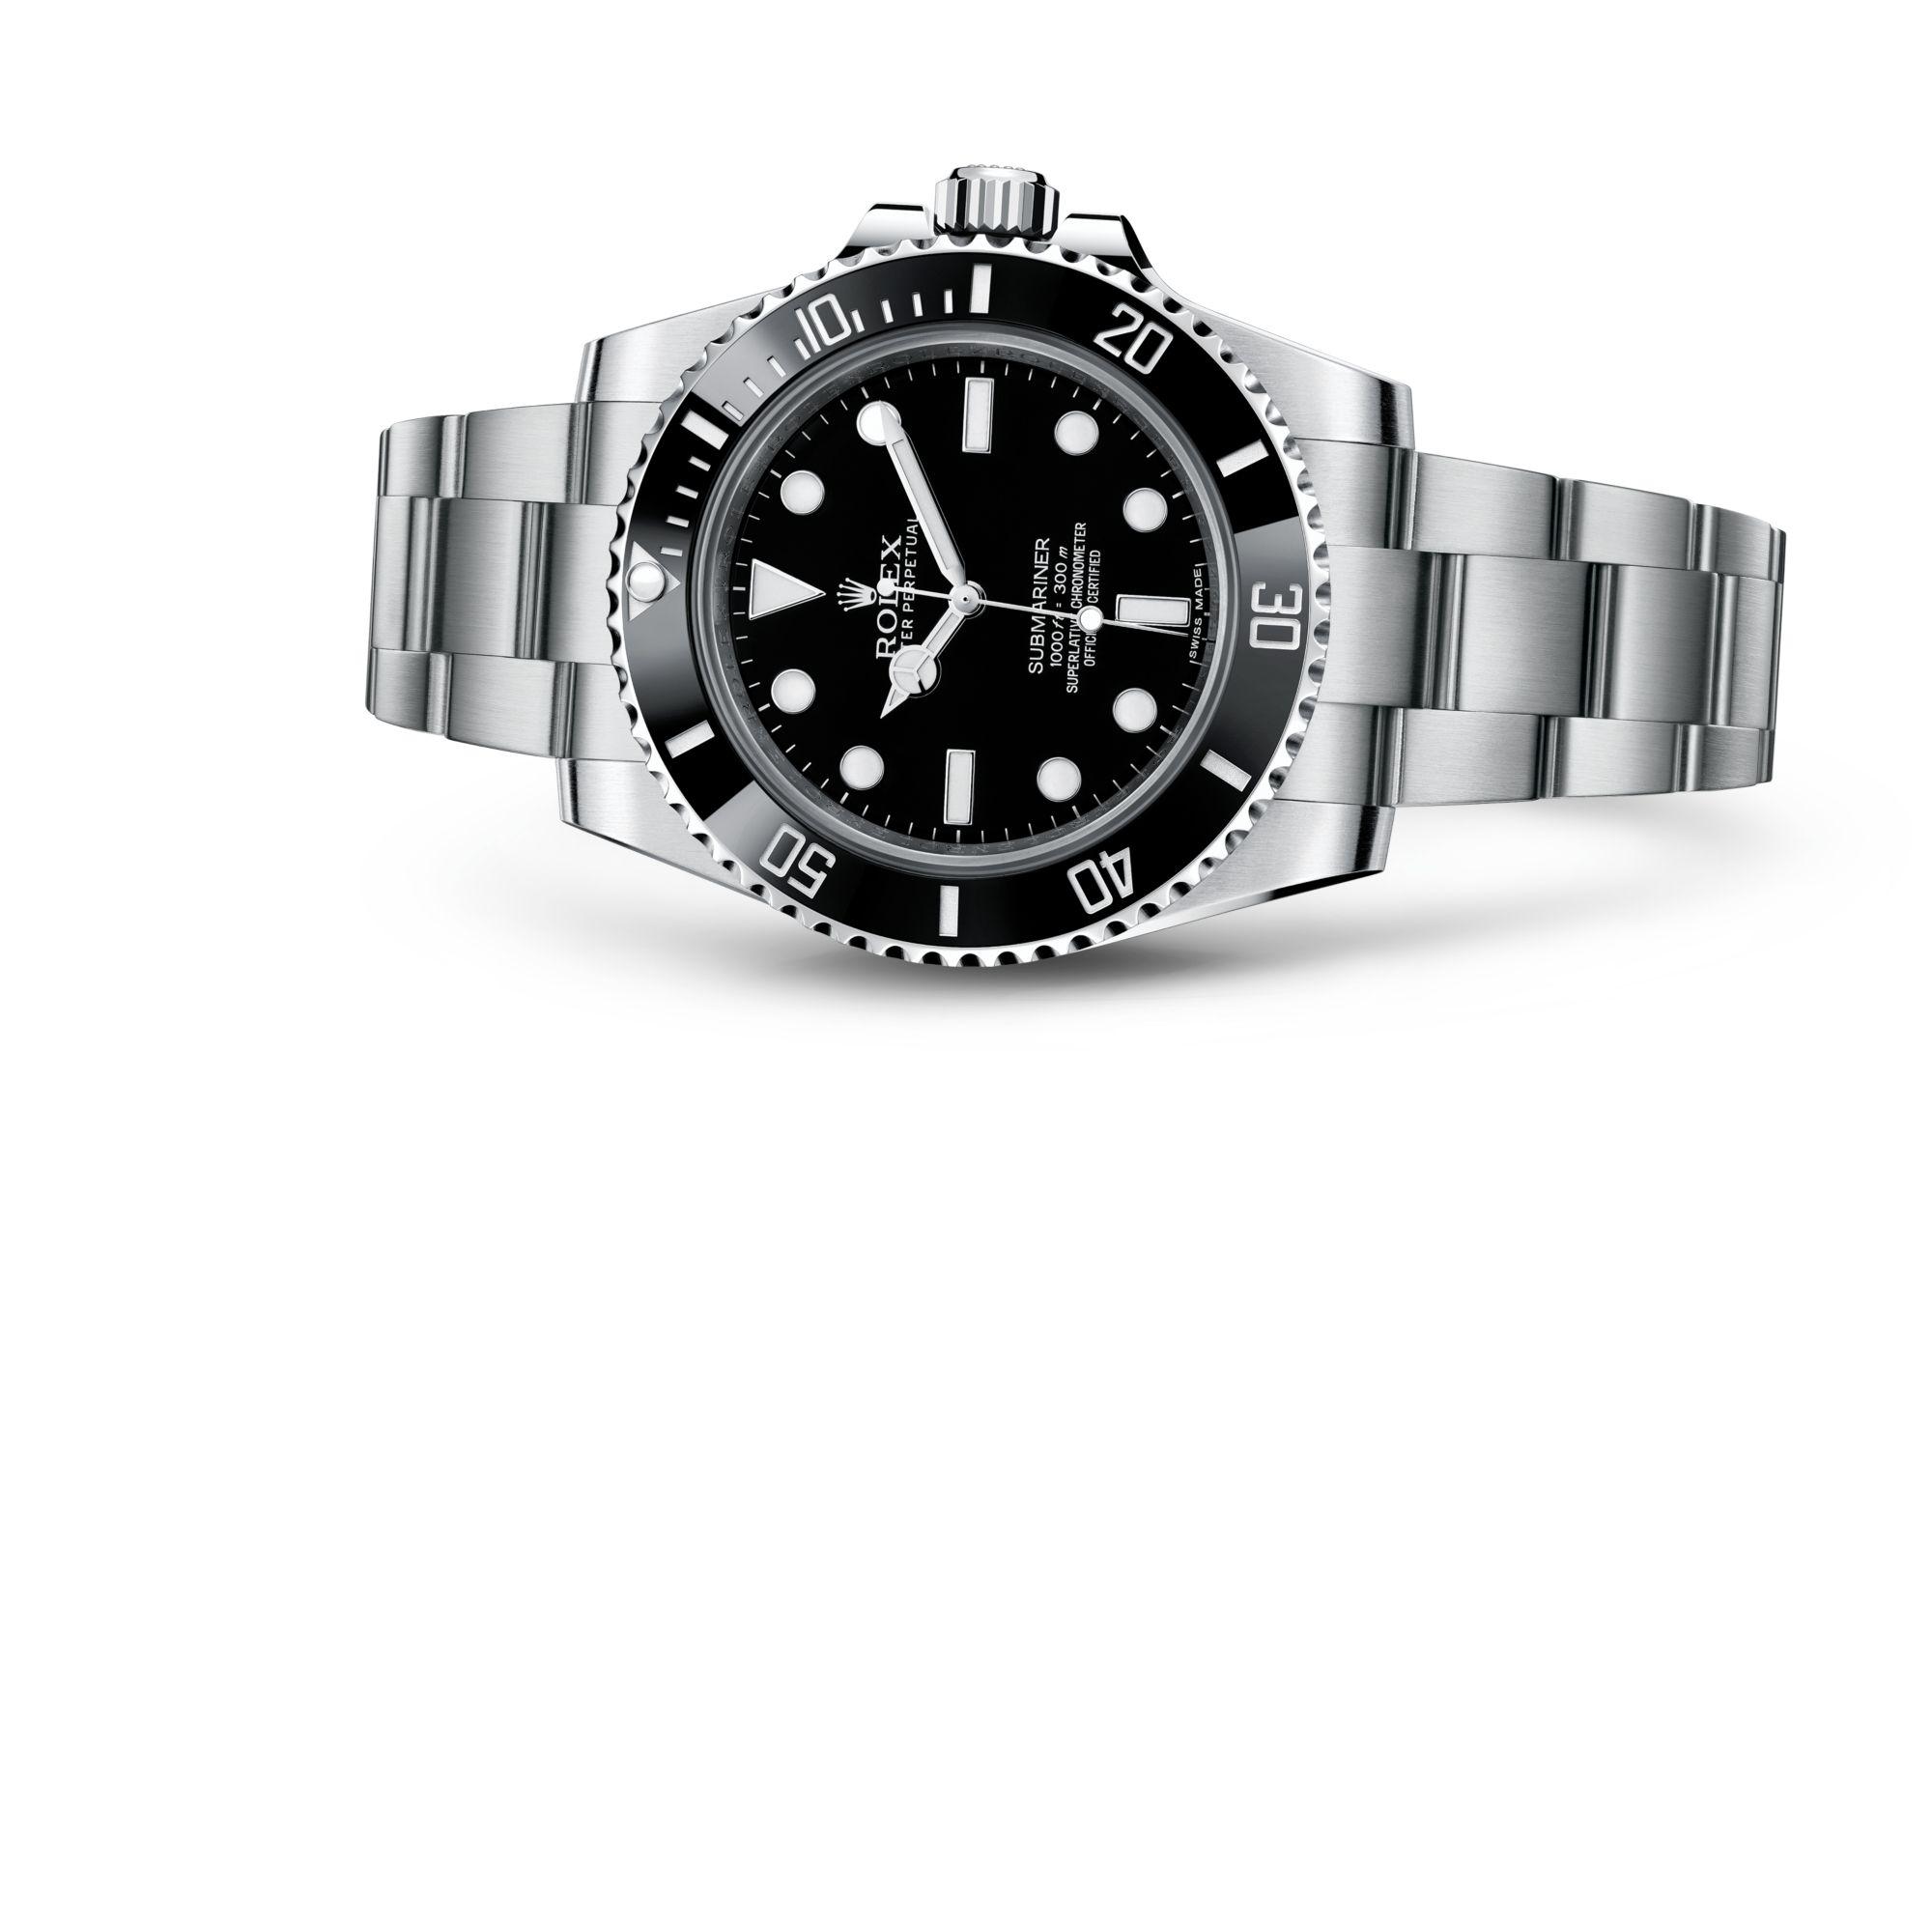 "Rolex <span lang=""en"">Submariner</span> M114060-0002"